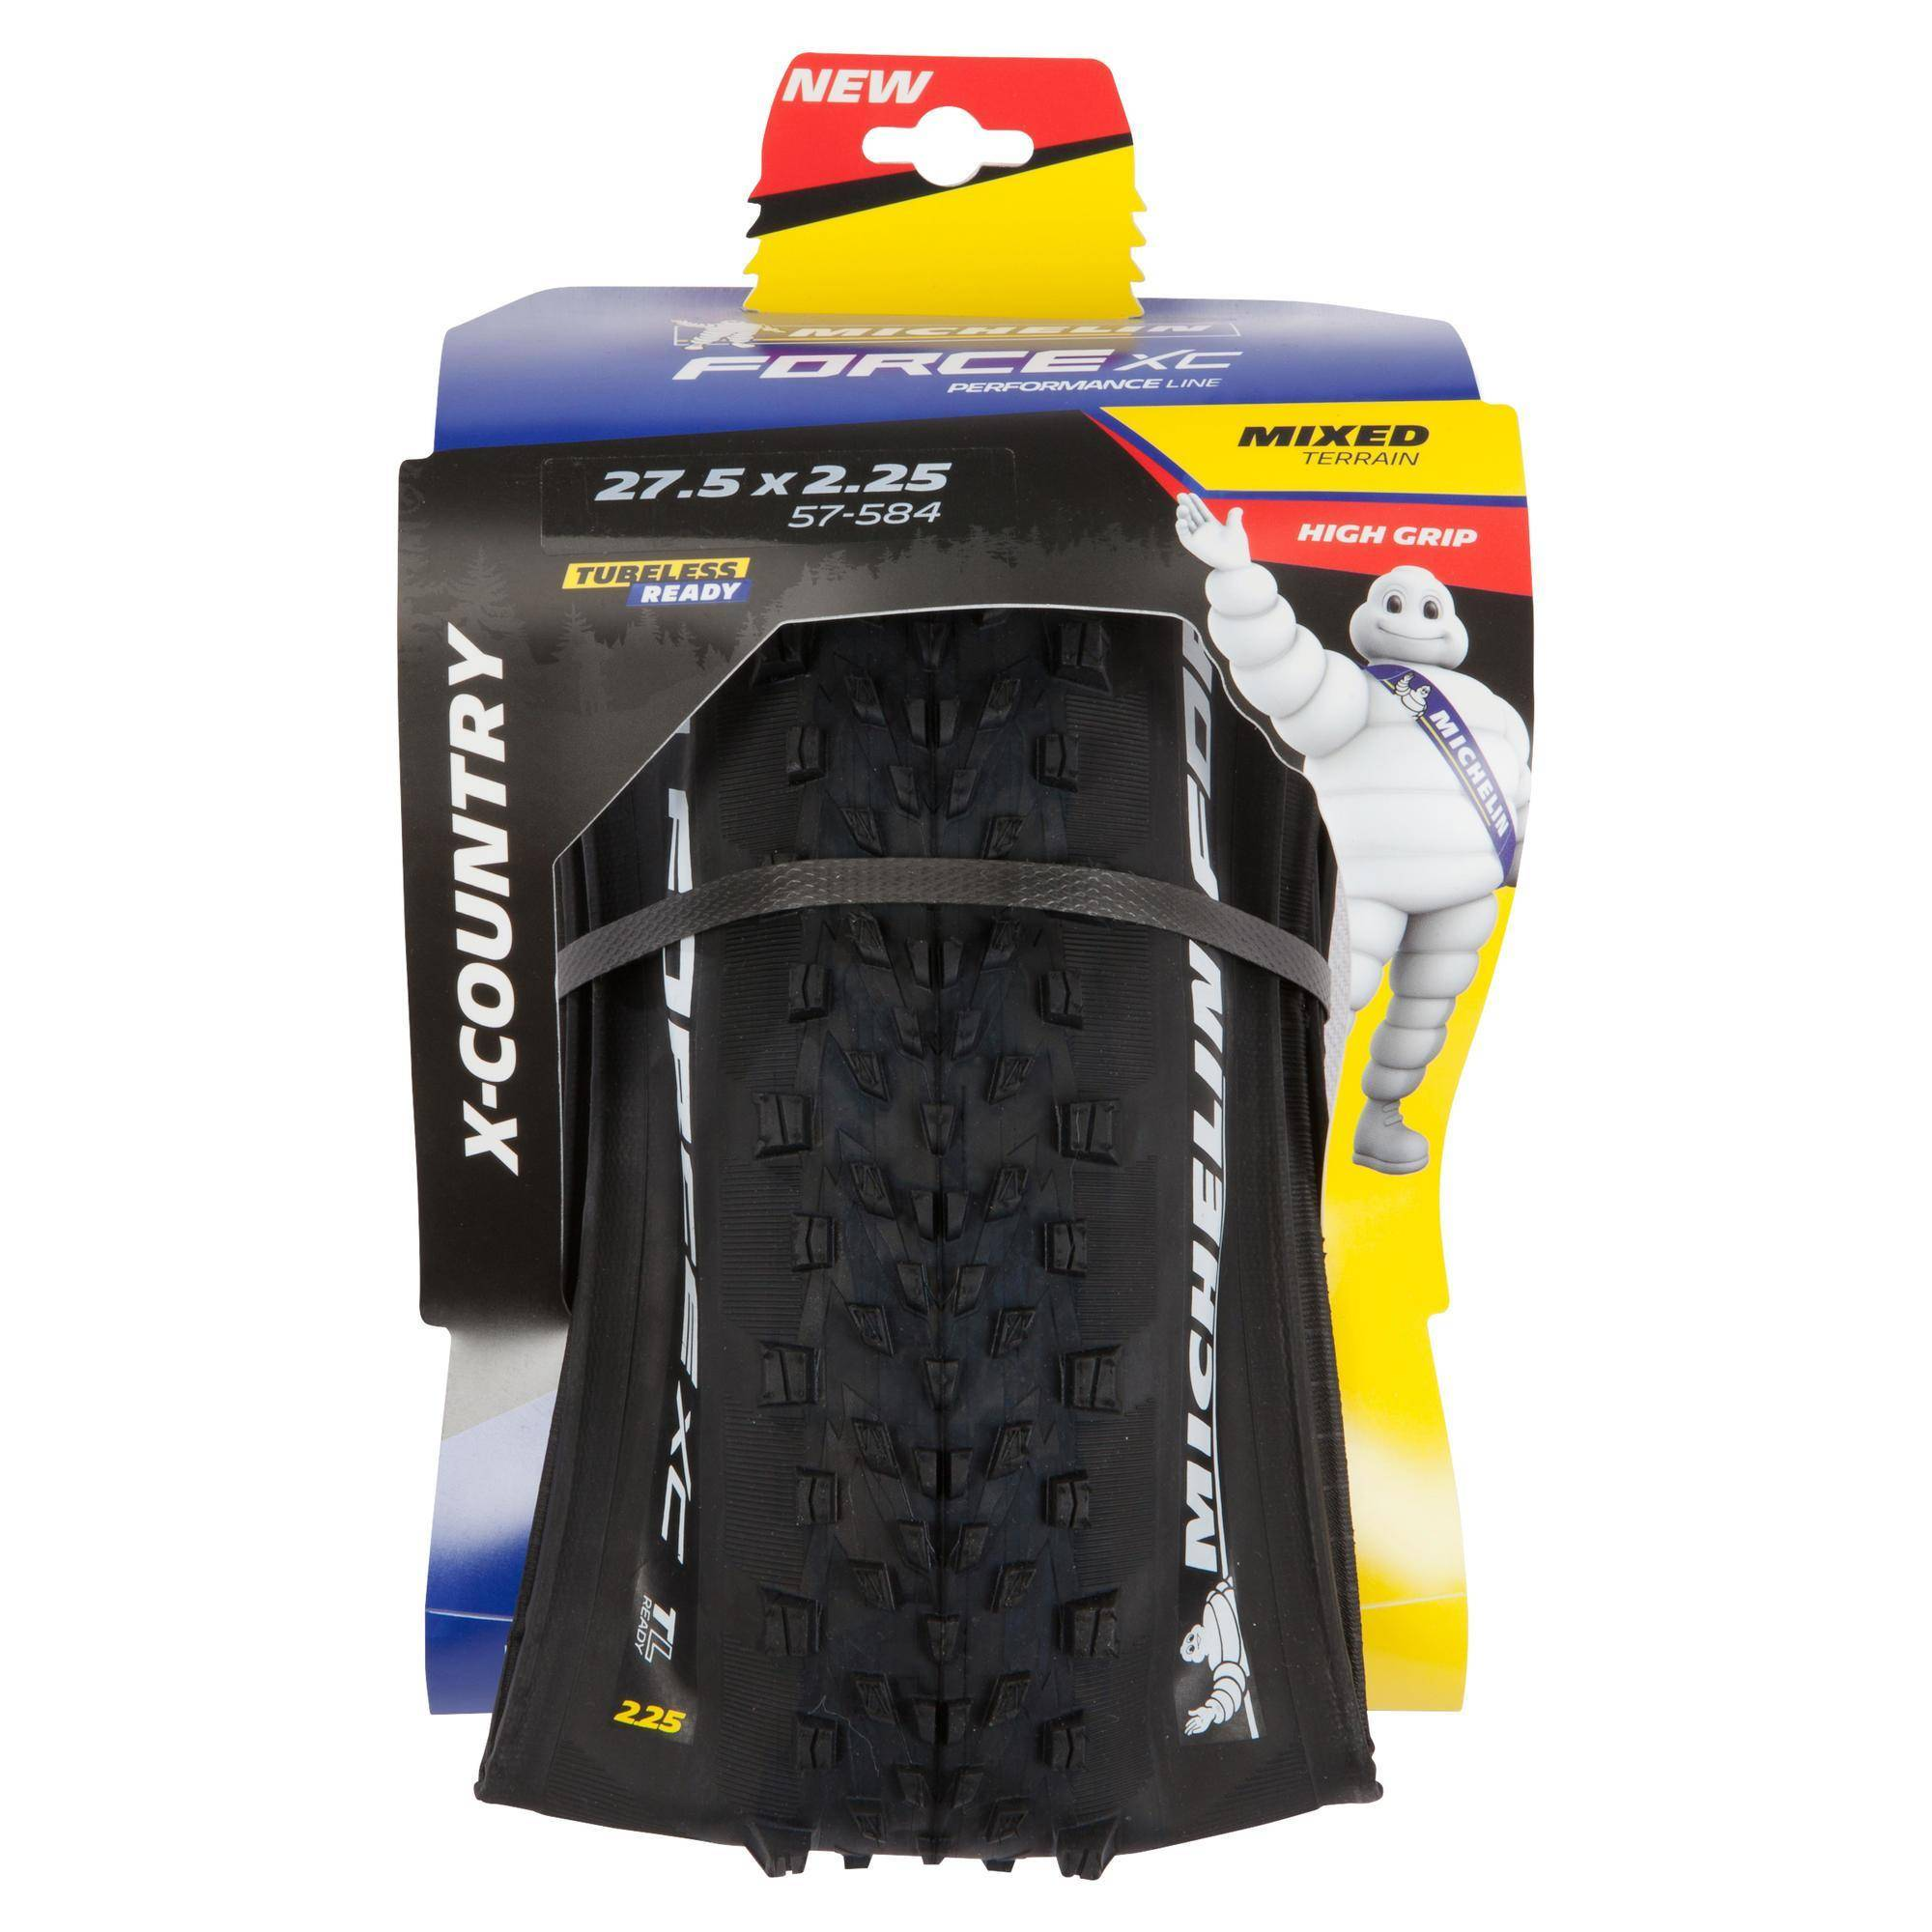 "Michelin Copertone mtb  FORCE XC PERF 27,5""x2.25 Tubeless Ready"